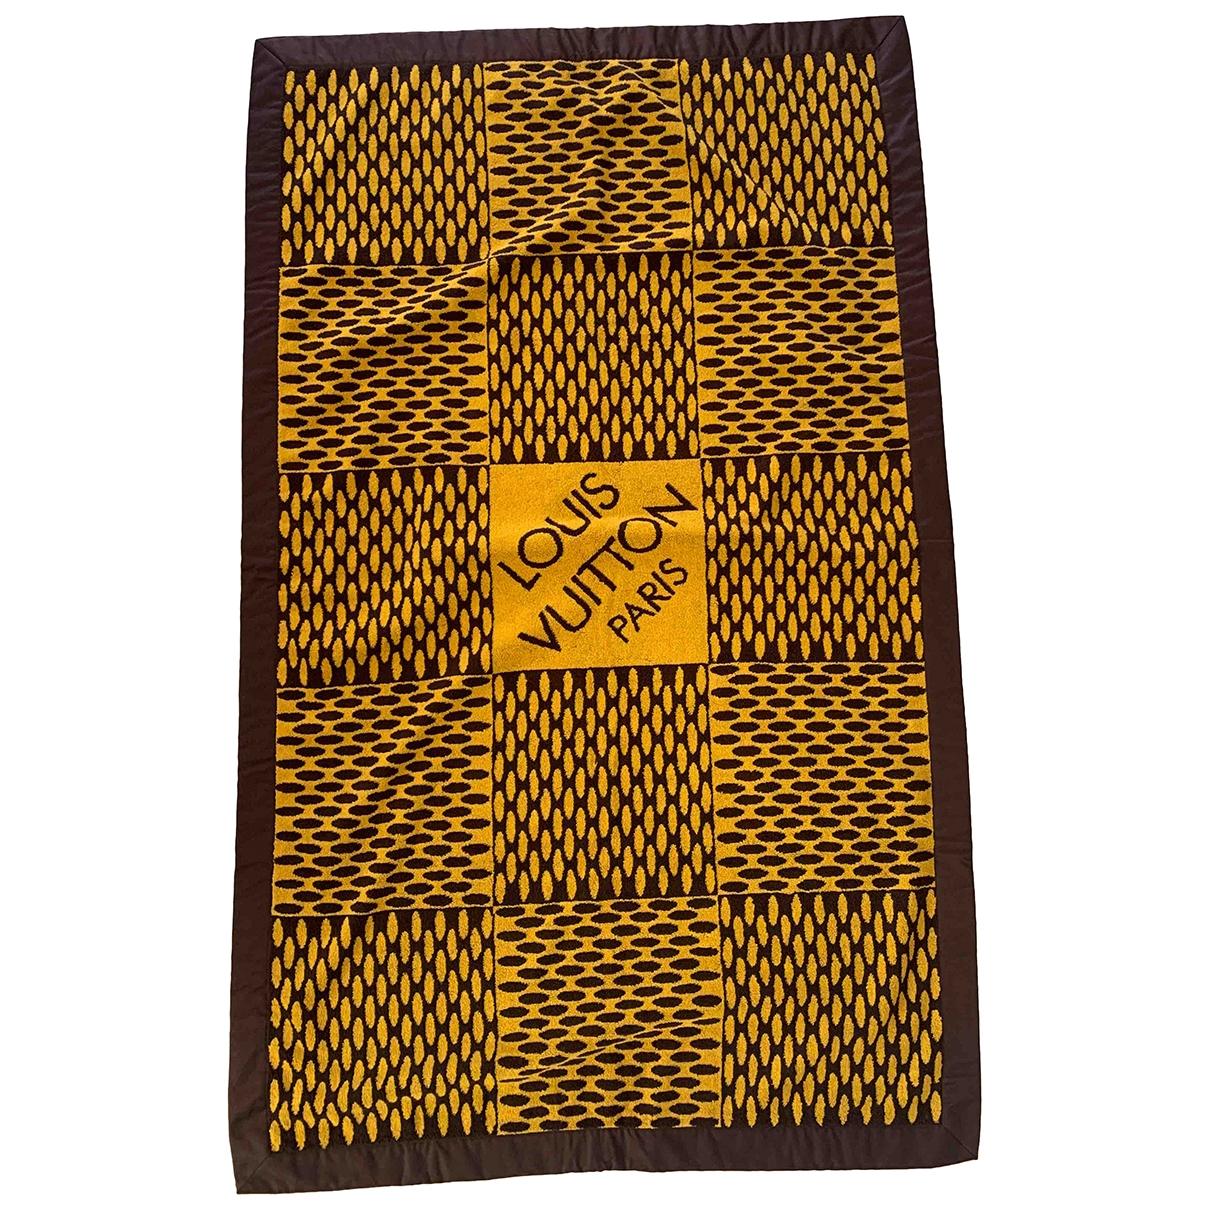 Textil de hogar Louis Vuitton